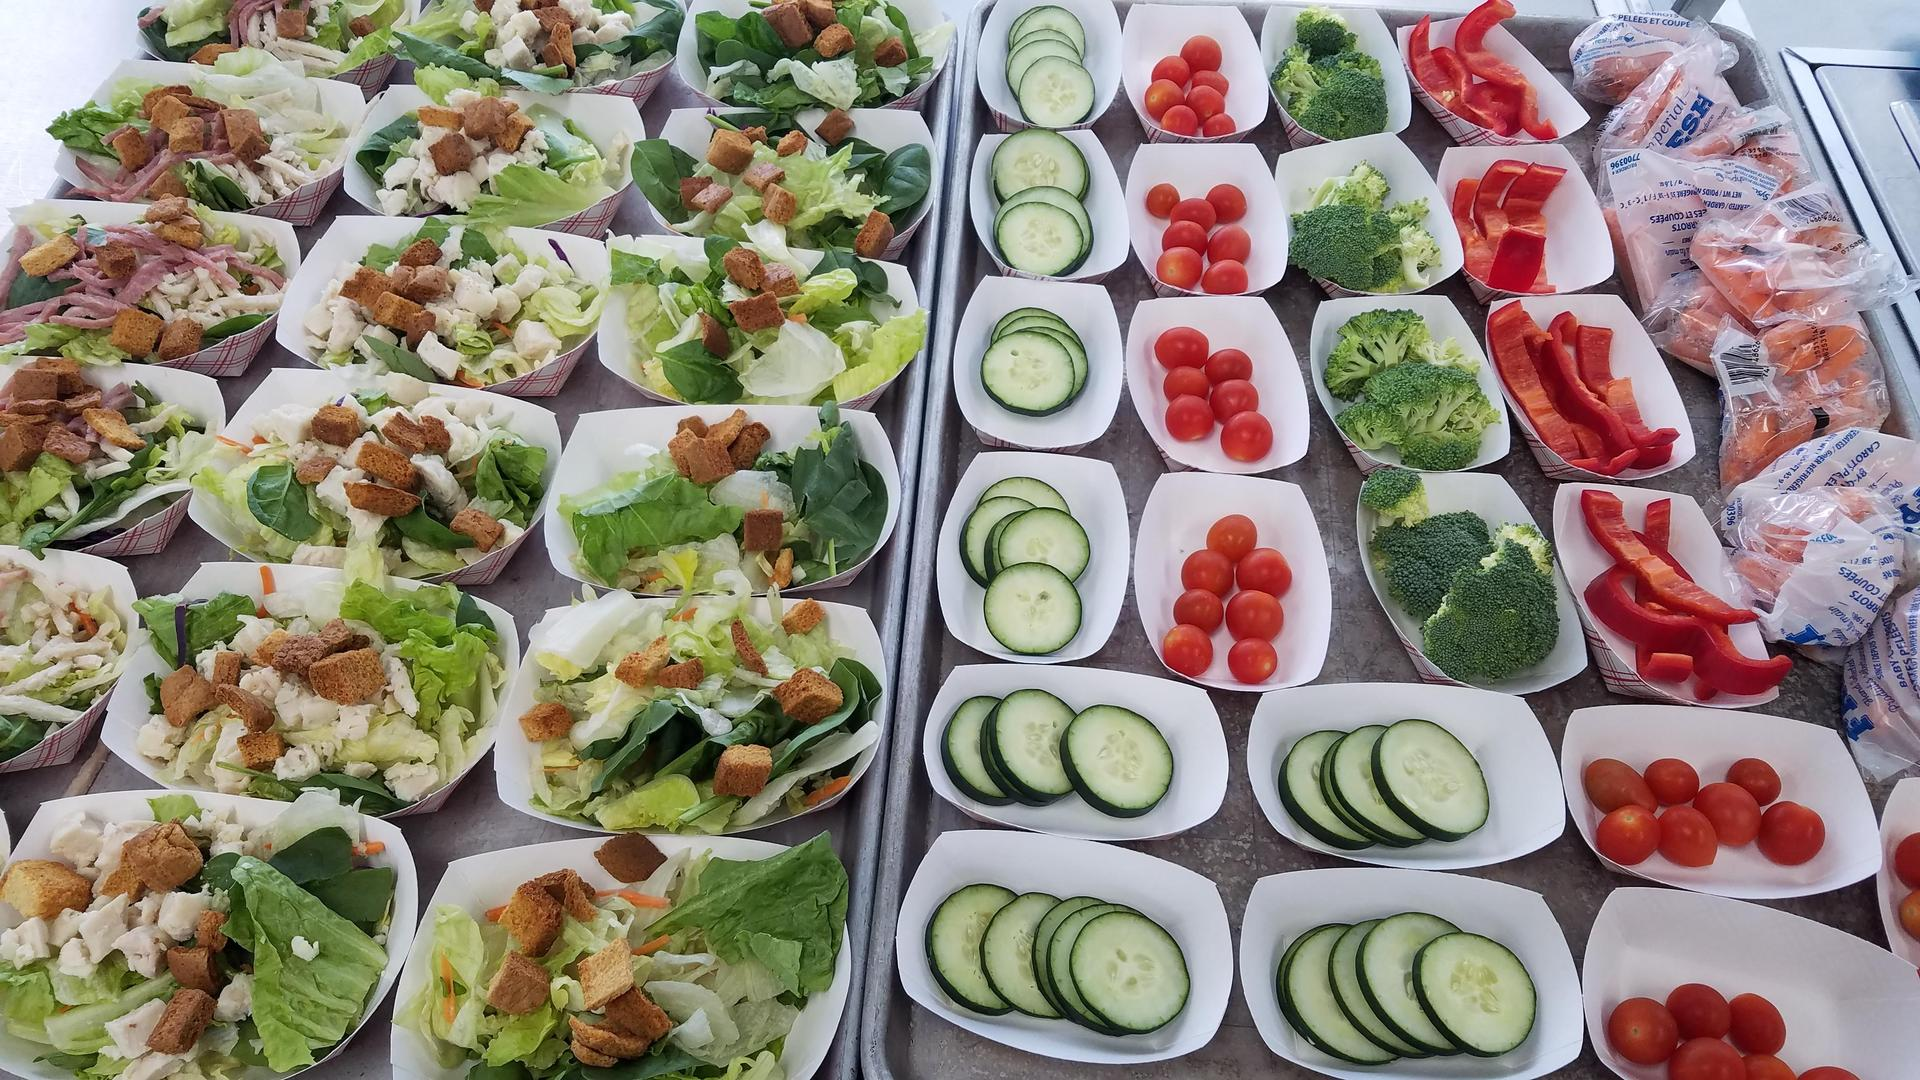 MMS Style Salad Bar